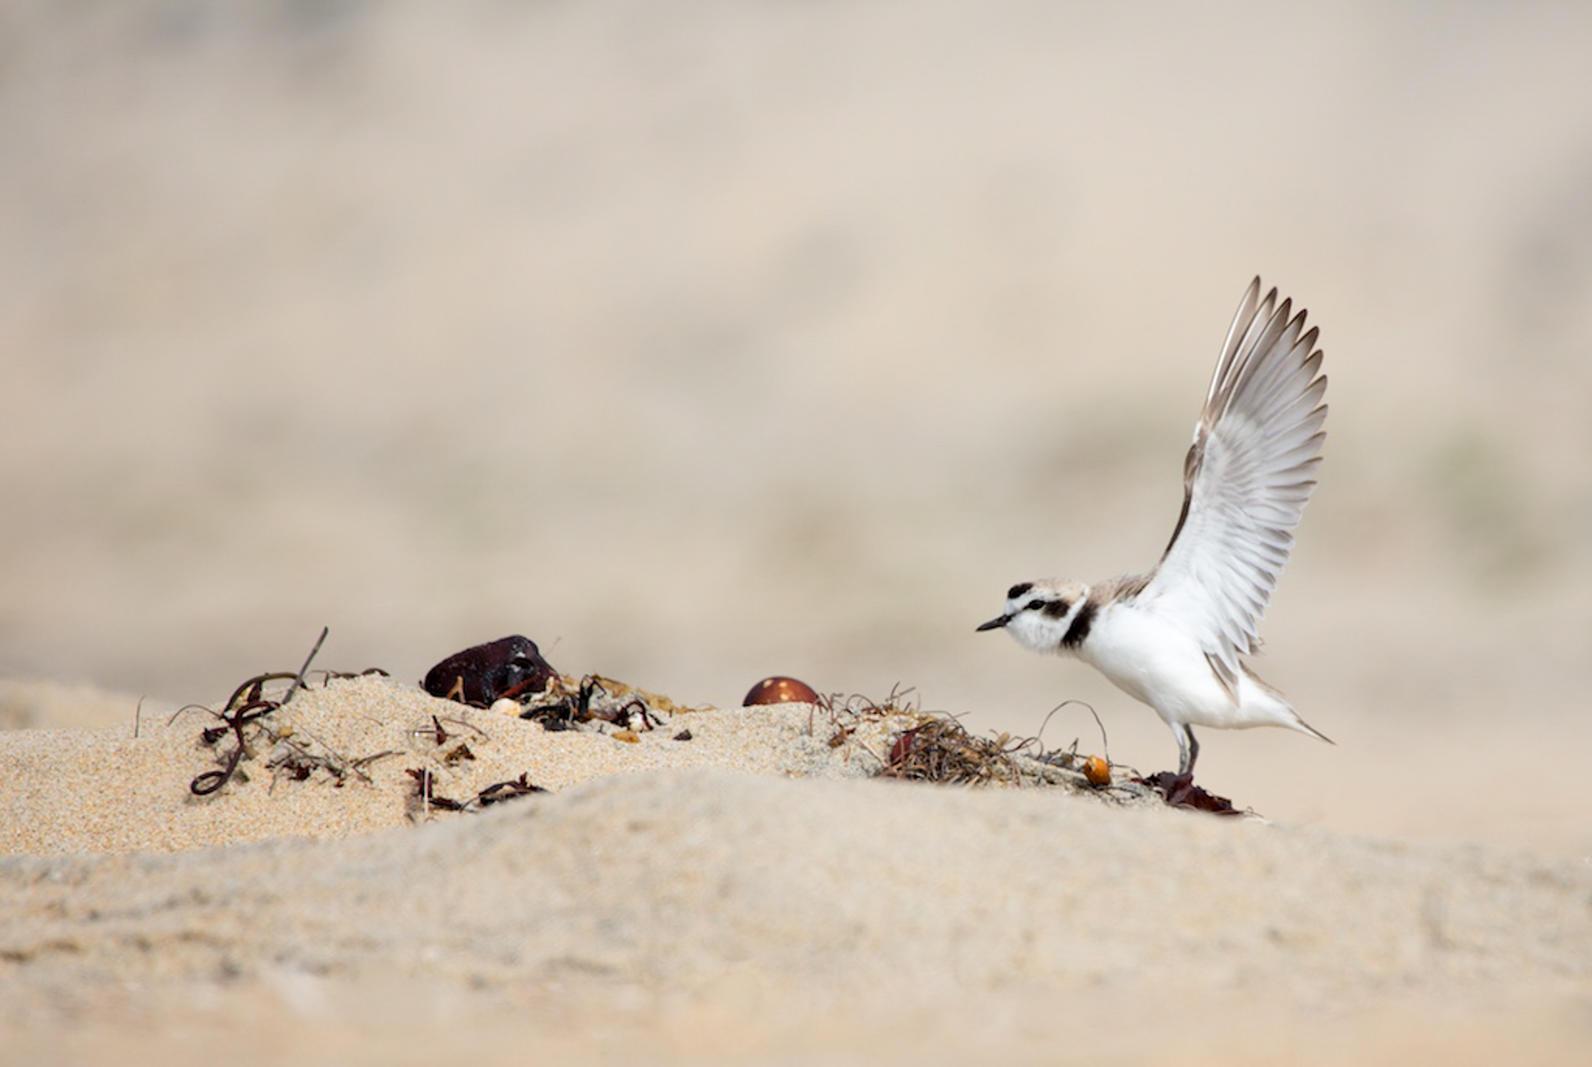 Snowy Plover. Photo: Alena Ebeling Schuld / Audubon Photography Awards.